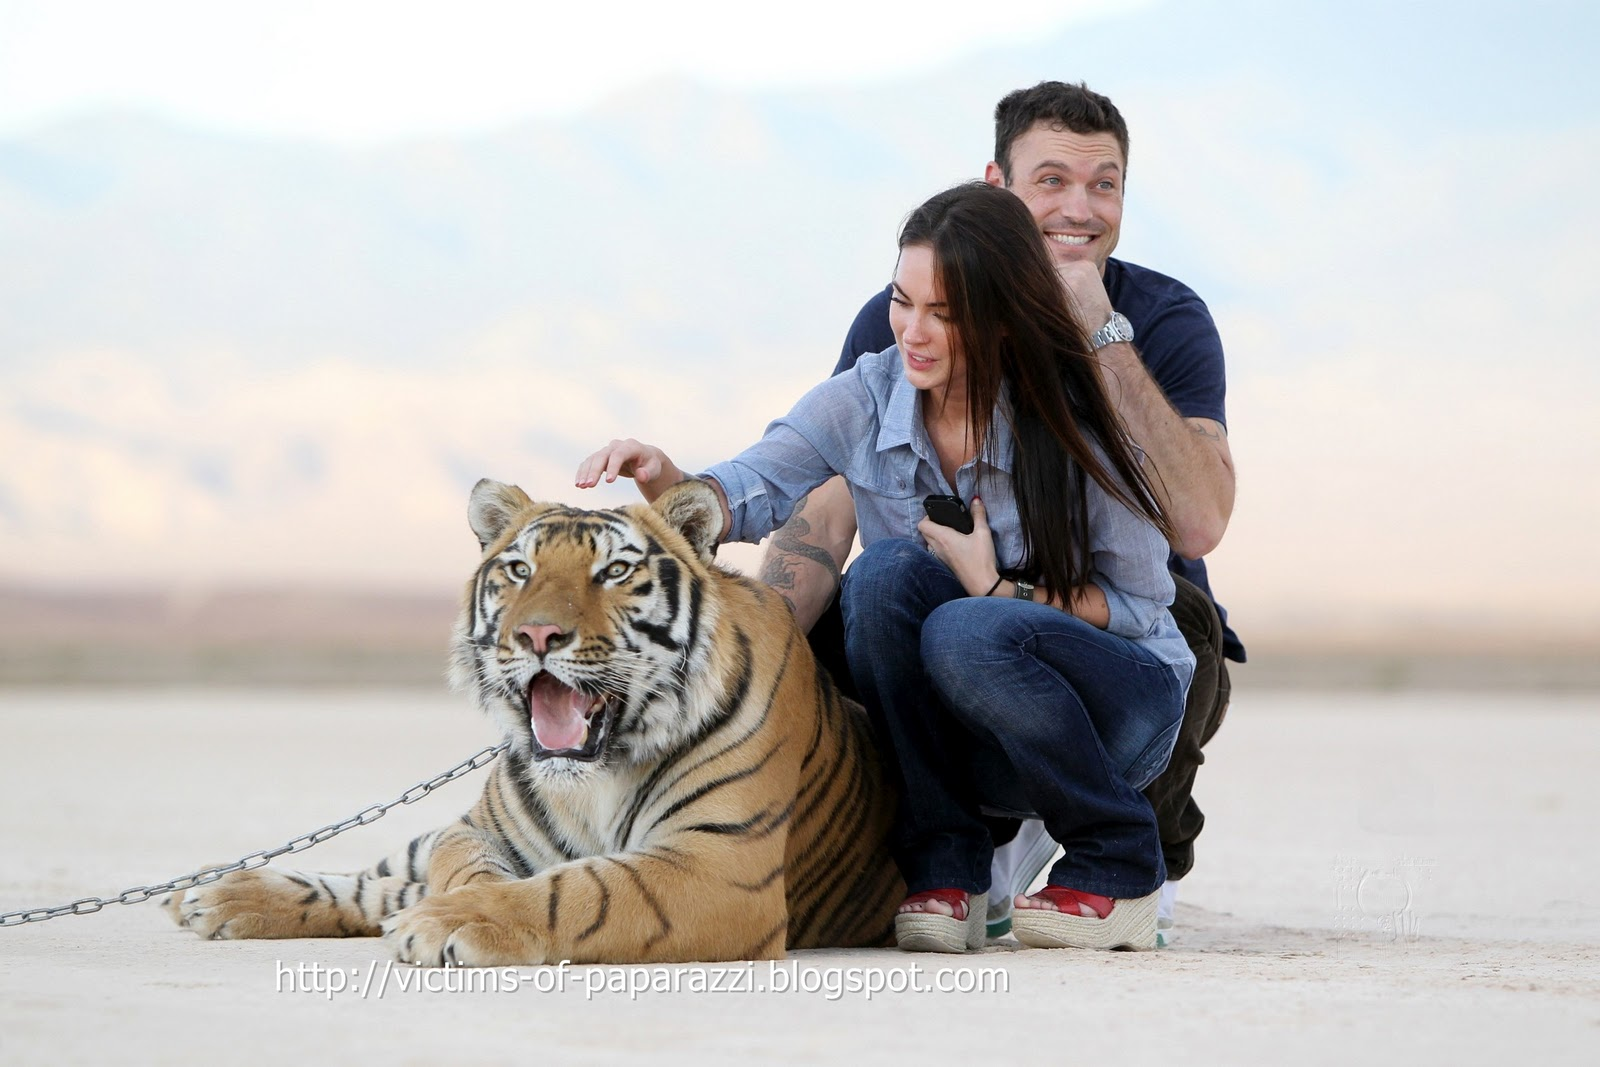 http://3.bp.blogspot.com/_NFcDSk31Yq8/TM-Q-TnJsoI/AAAAAAAAATE/KOnxfwio-7E/s1600/Megan+Fox+at+Big+Cat+2.jpg